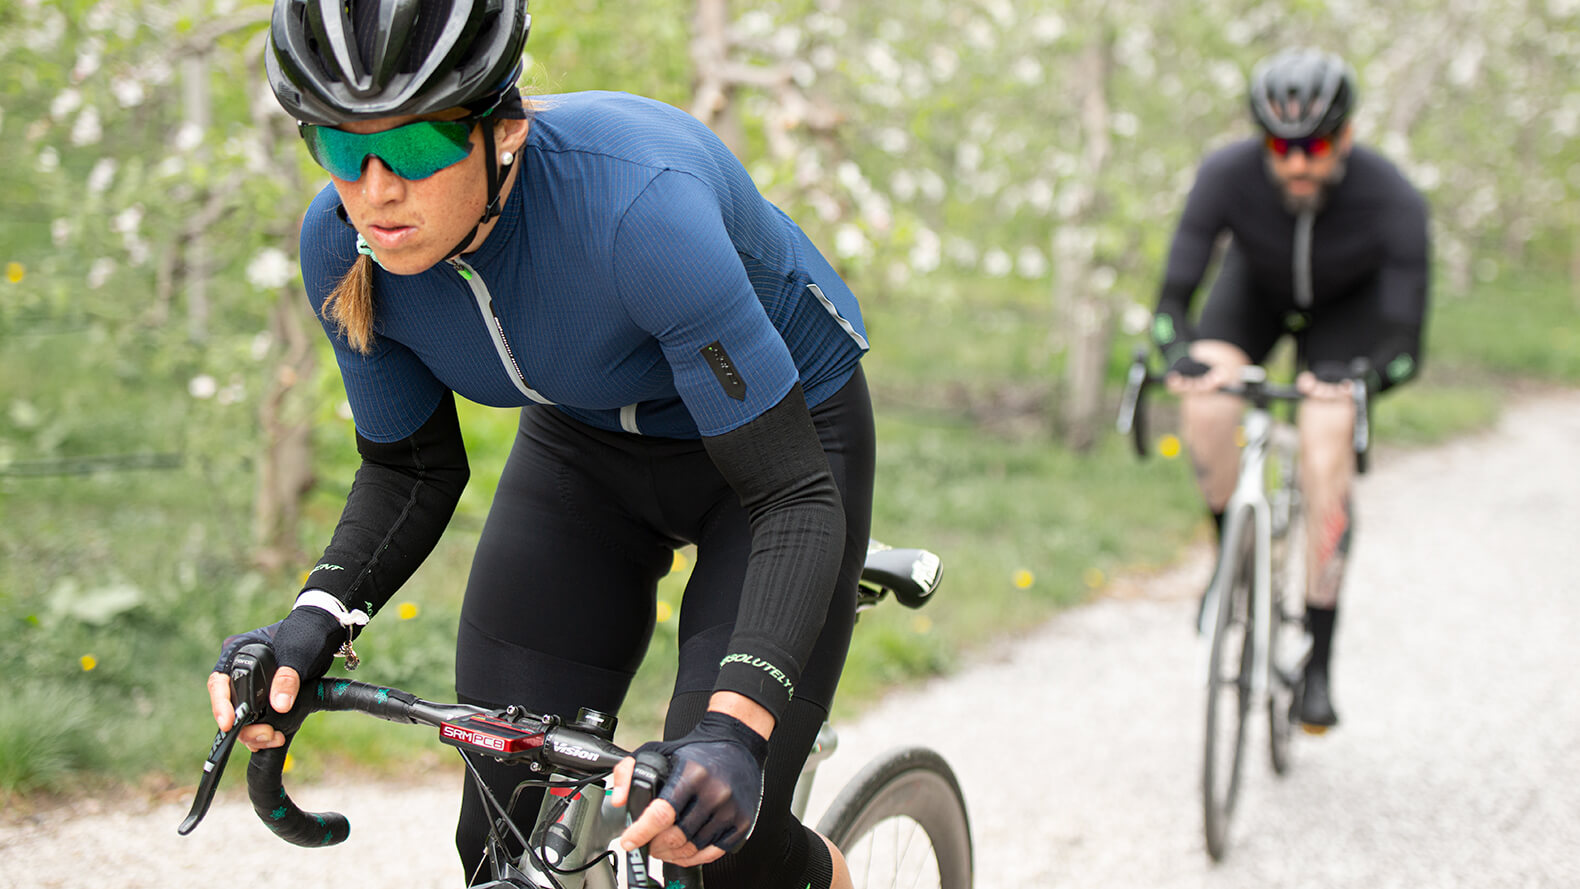 Cycling arm warmers